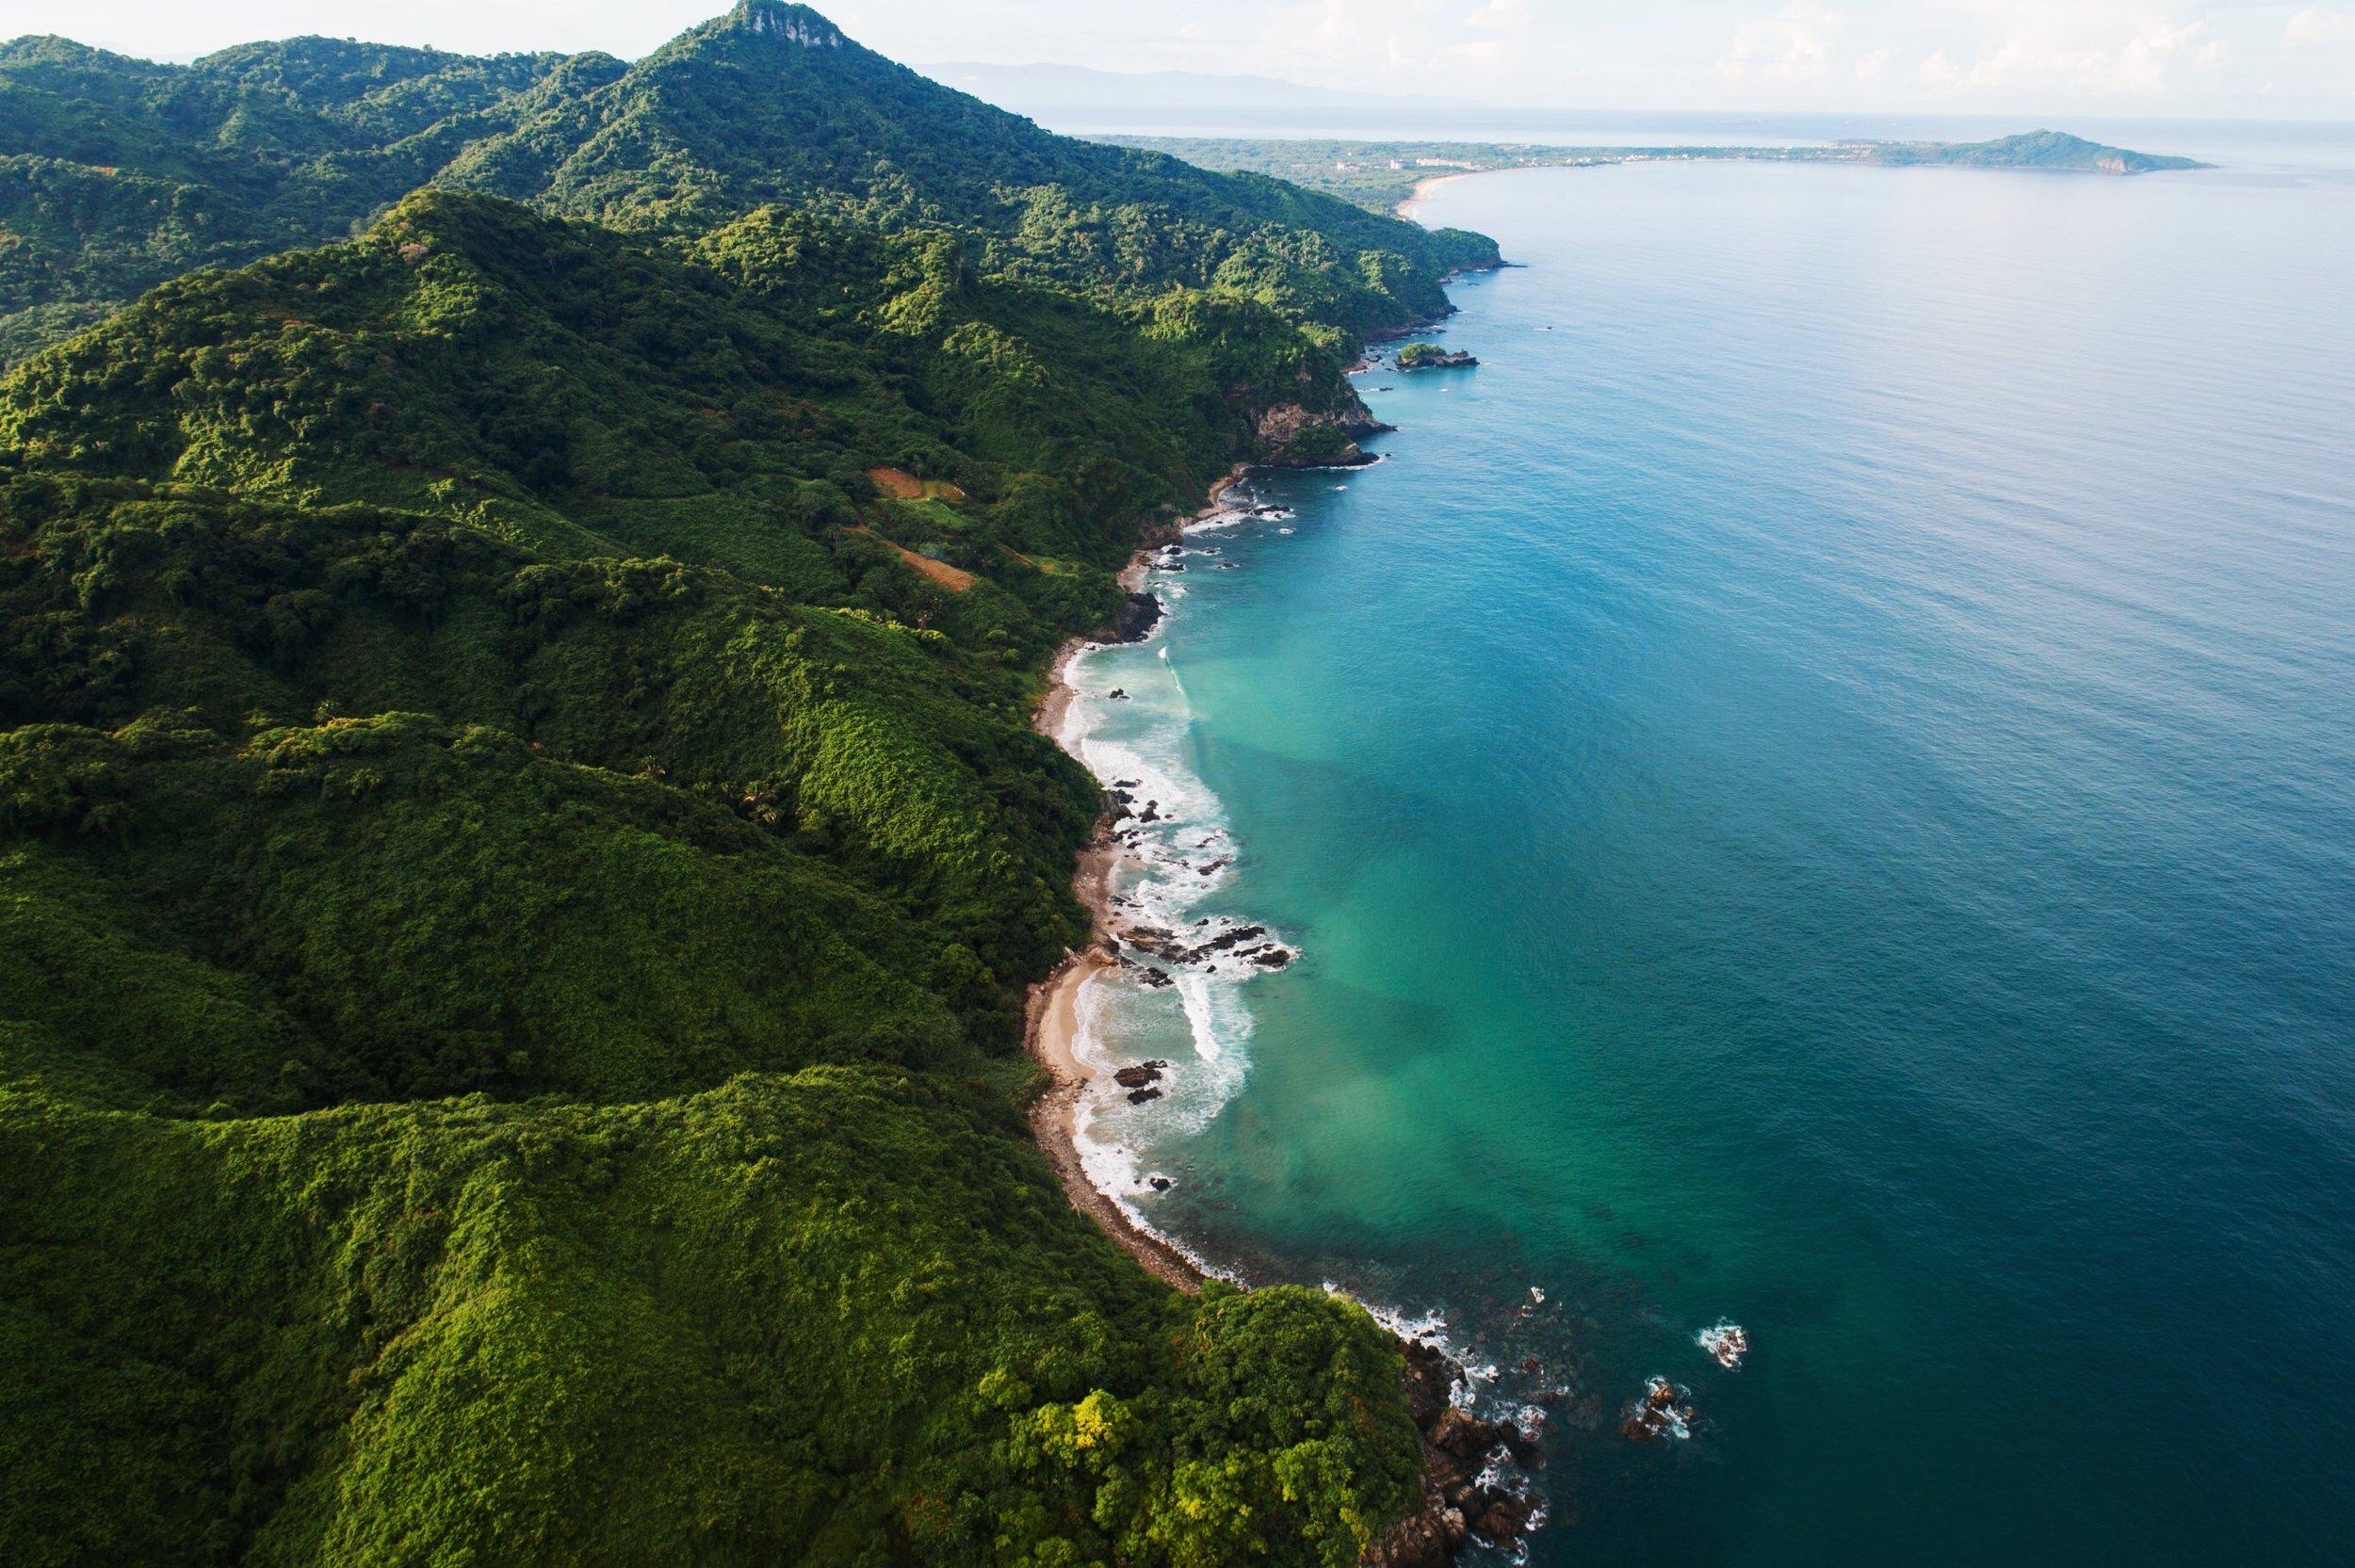 Tristan-Guibald-Surf-México-Sayulita-Pascuales-Zihuatanejo-Fotografía-Heiko-Bothe-8.JPG